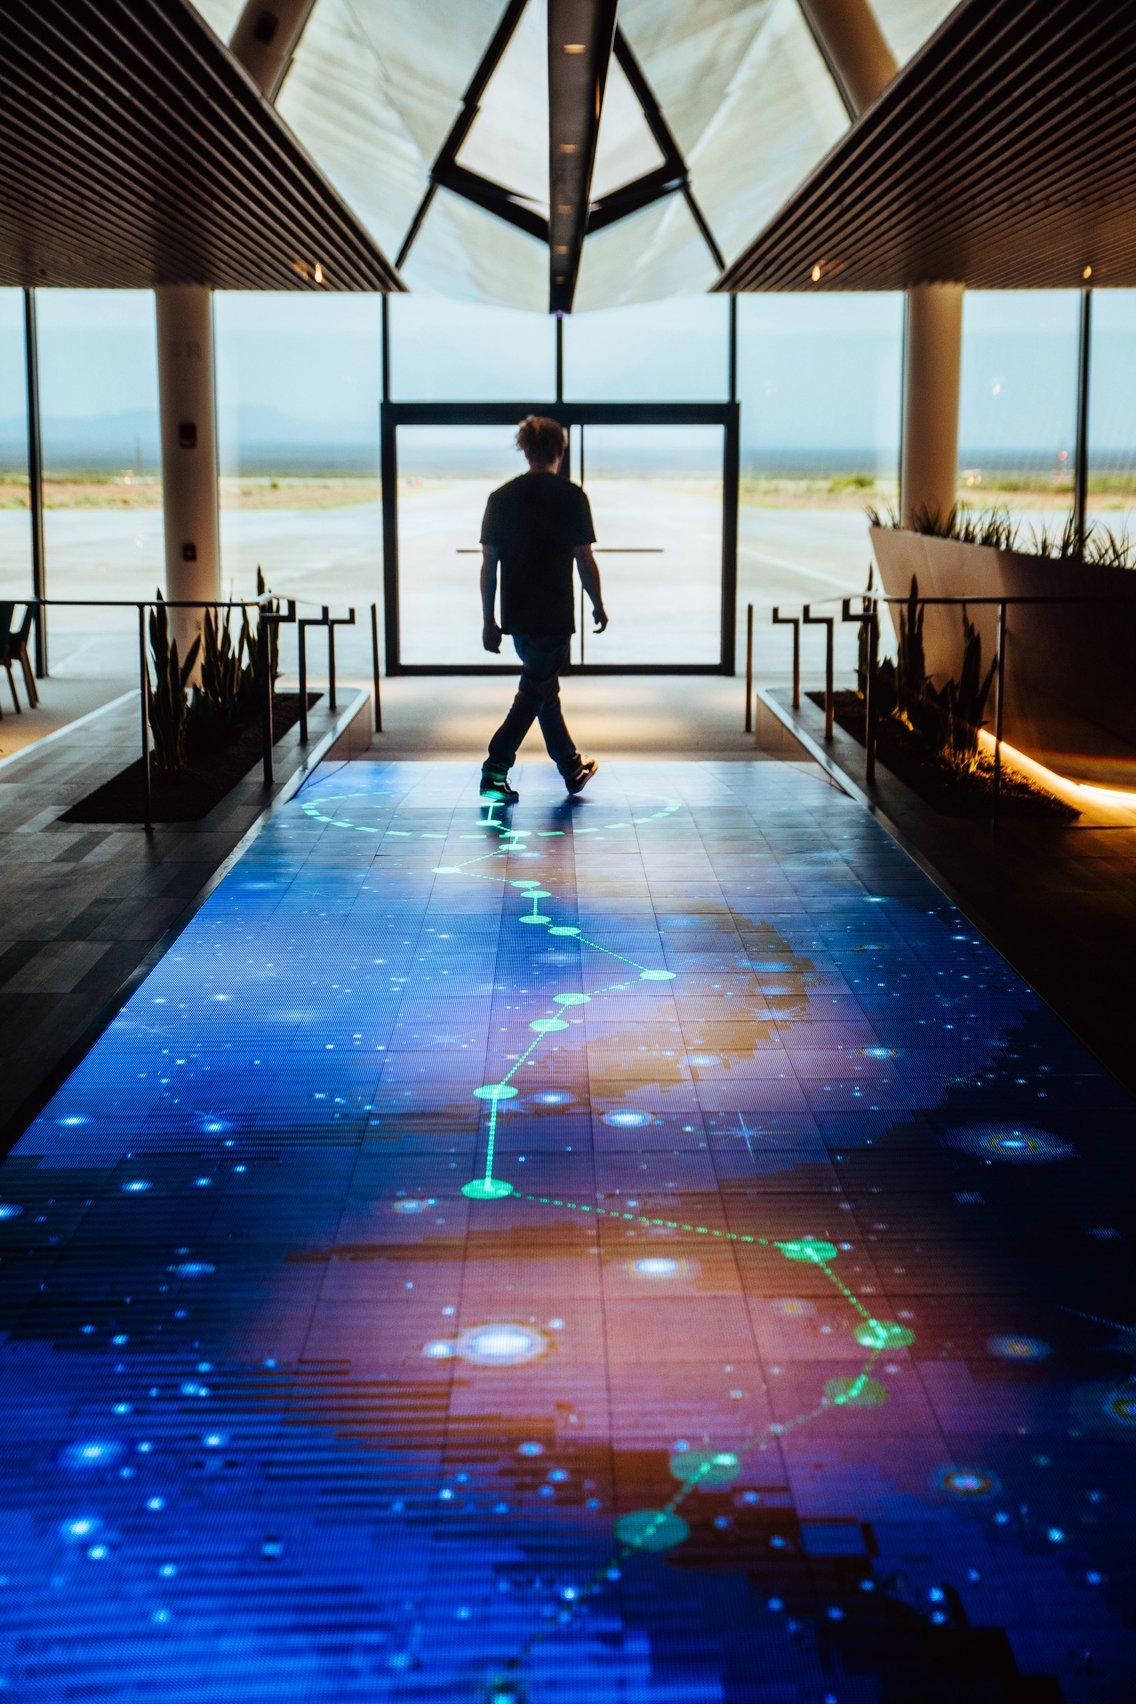 AstroWalk floor interactive led display